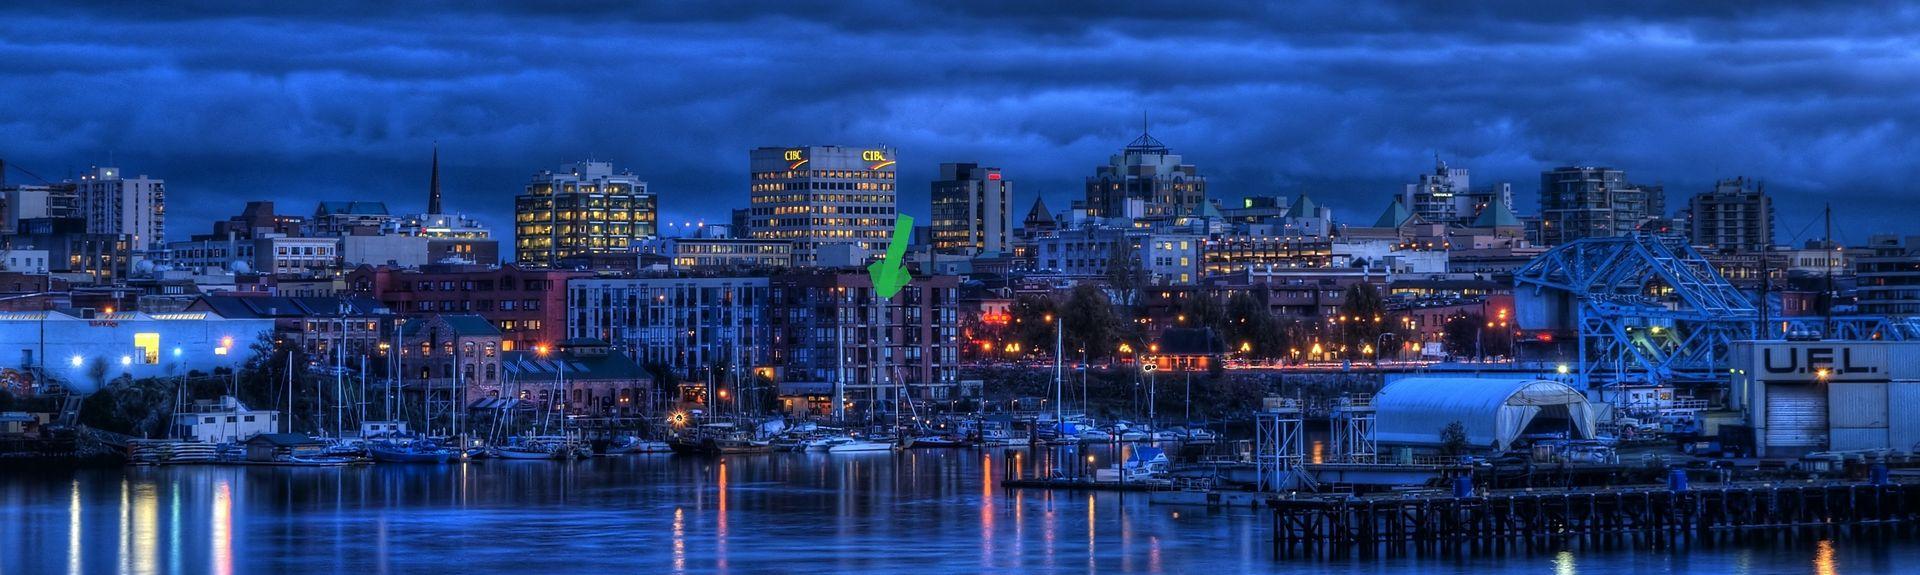 Swartz Bay Ferry Terminal, Sidney, British Columbia, Canada